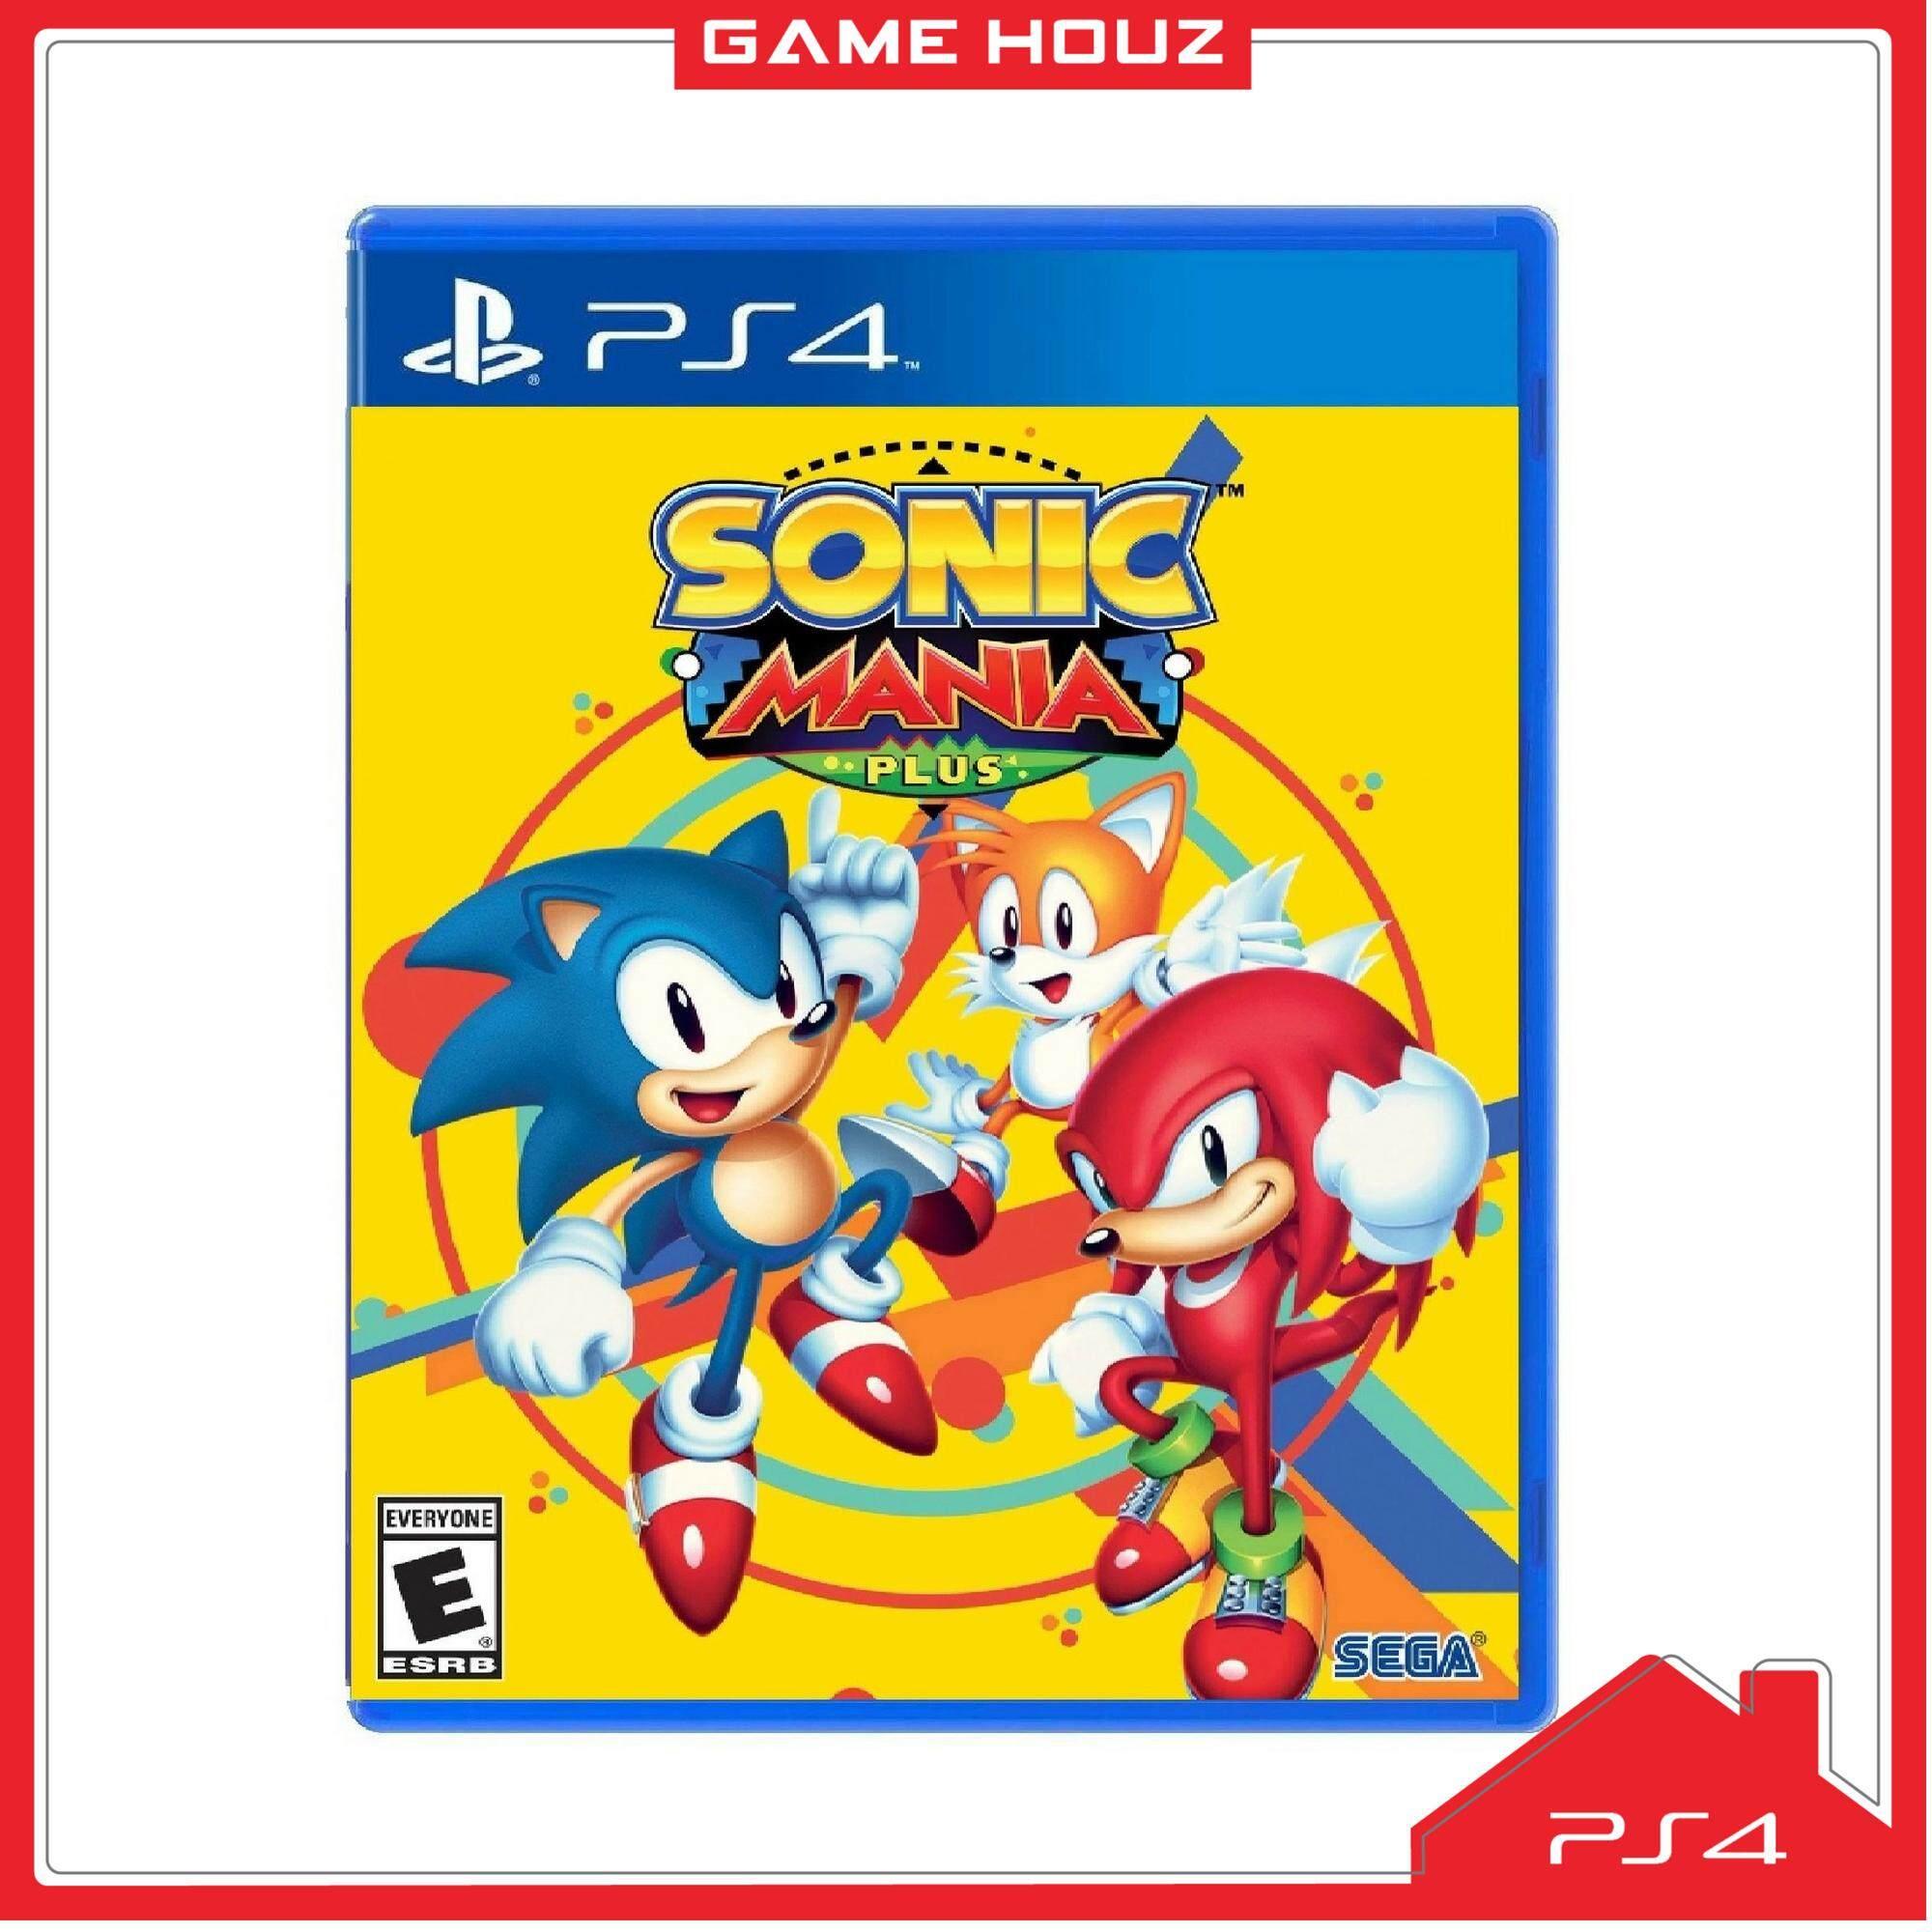 Sega Games Buy Game On Lazada Malaysia Free Shipping Ps4 Yakuza Kiwami 2 Steelcase Region 3 English Sonic Mania Plus R3 Eng